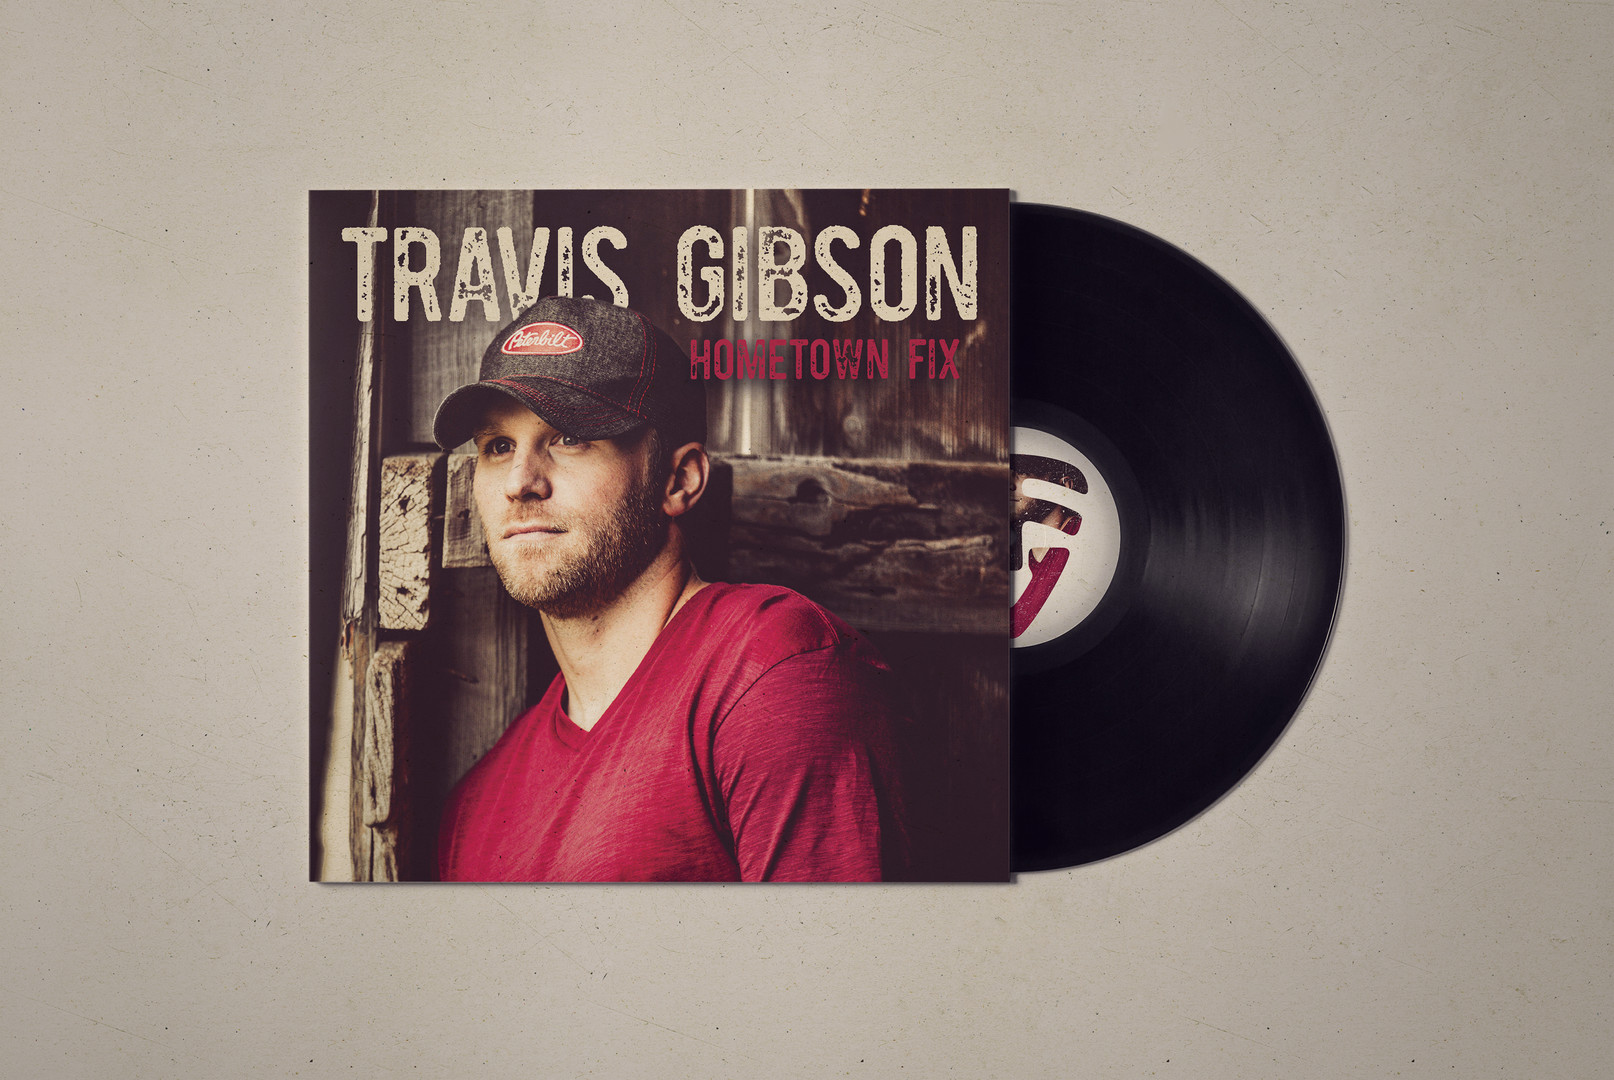 Travis-Gibson-Hometown-Fix-Cove-mockup.j